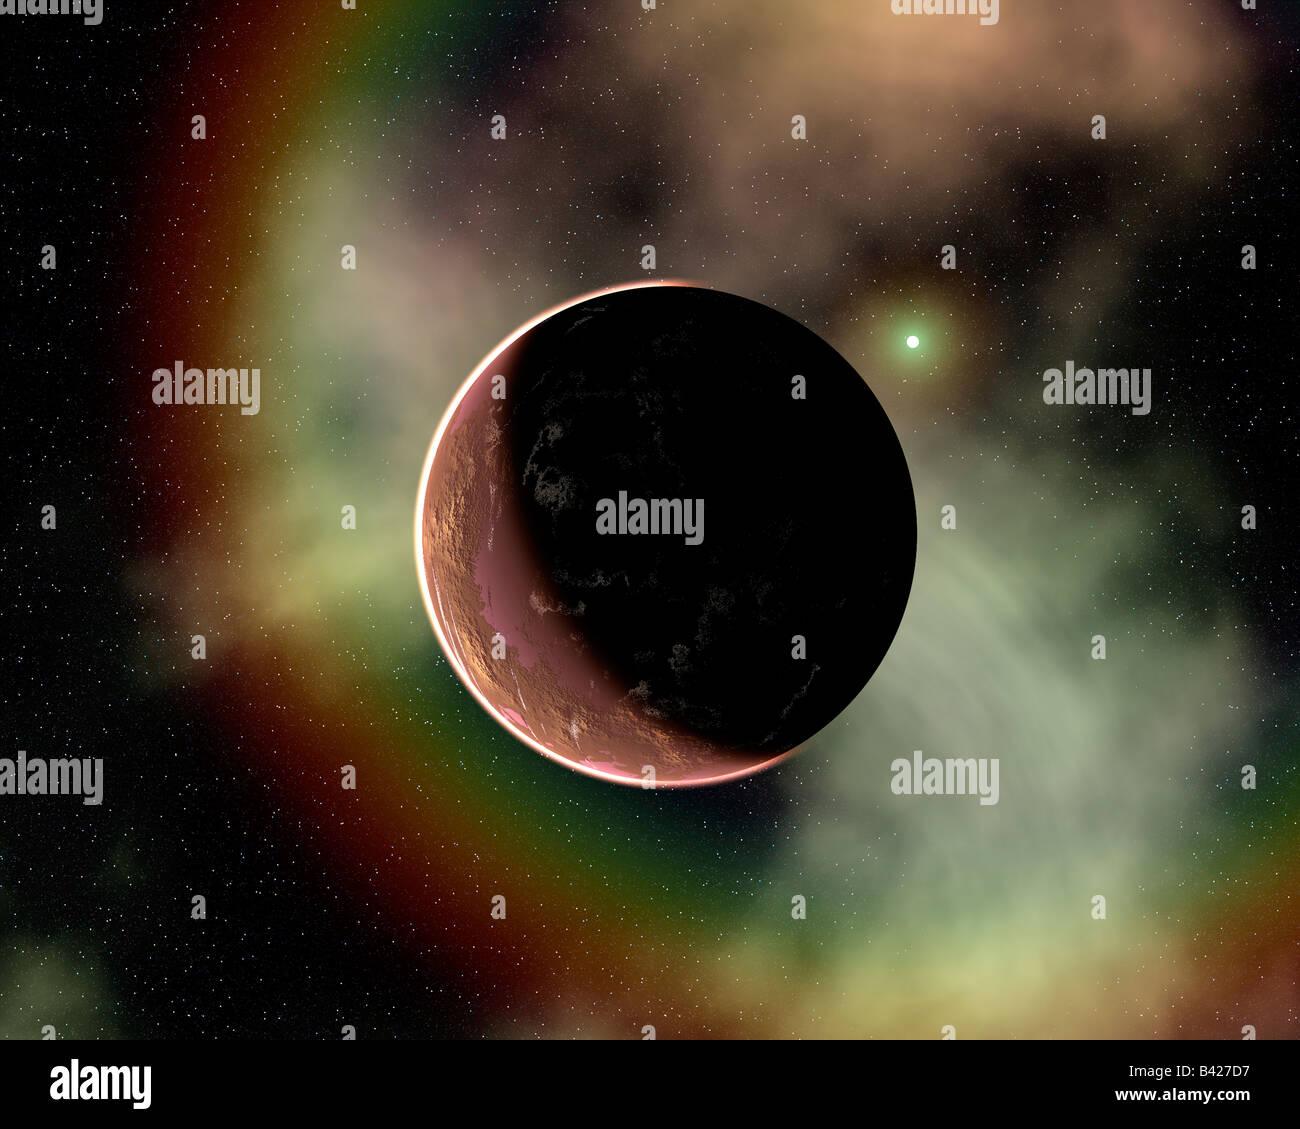 Rainbow Nebula A SciFi,Fantasy Concept Image. - Stock Image